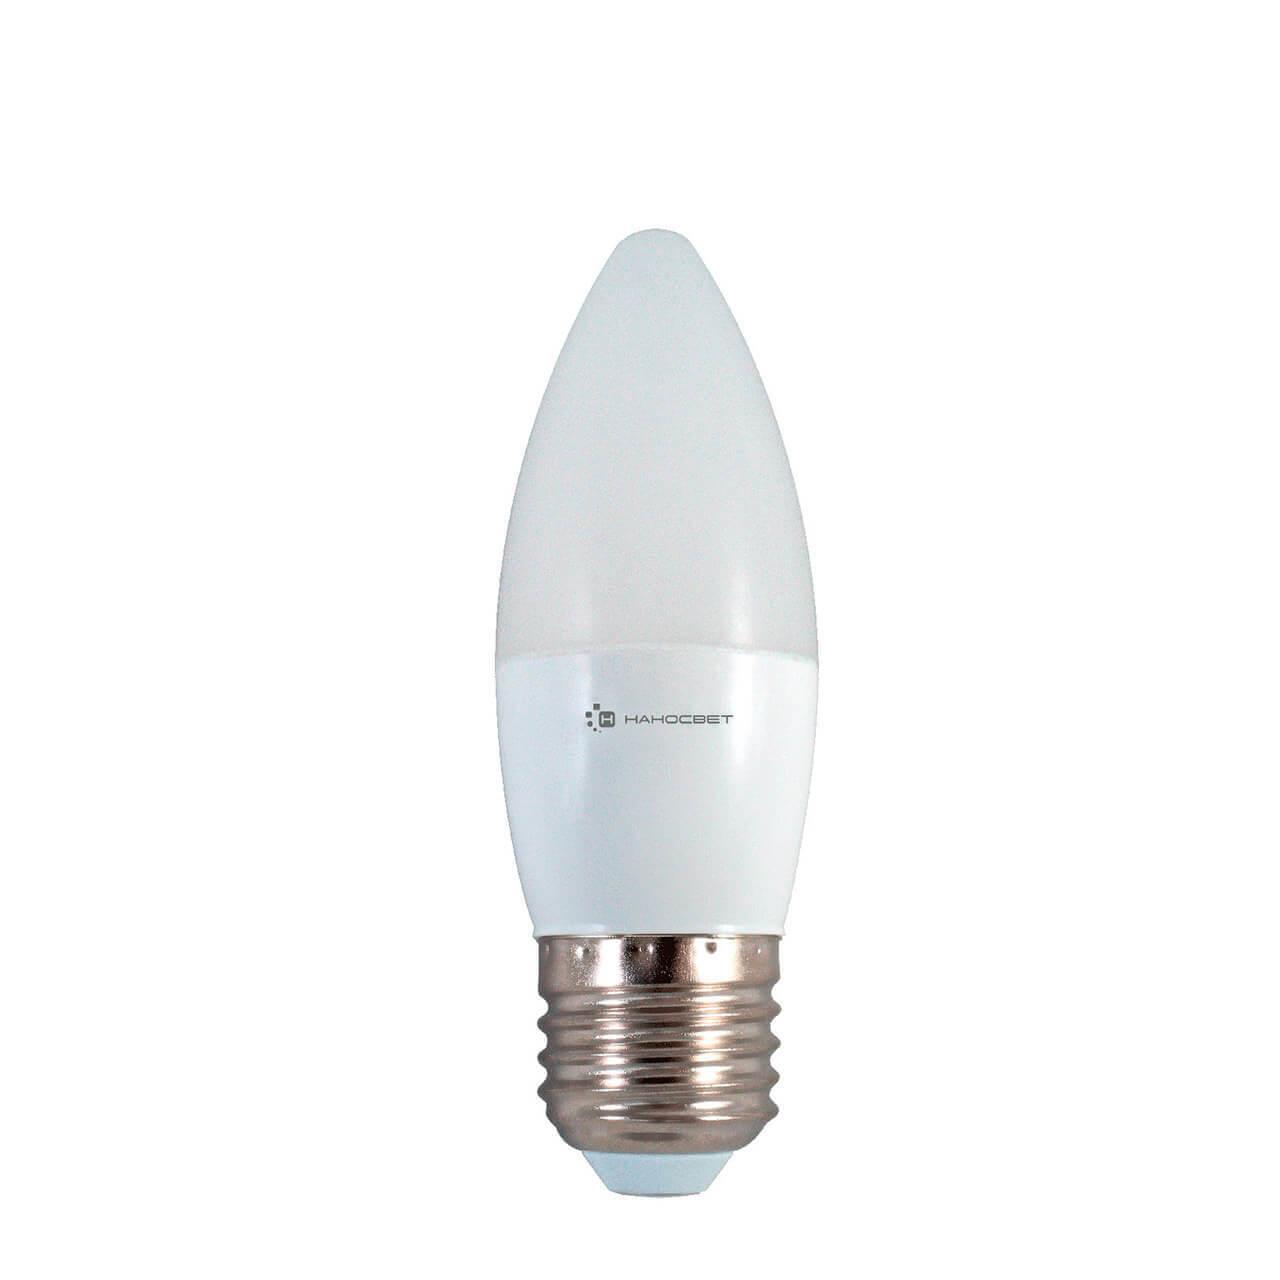 Лампа светодиодная Наносвет E27 6W 2700K матовая LE-CD-6/E27/827 L252 лампа светодиодная e27 6w 2700k свеча матовая le cd 6 e27 827 l252